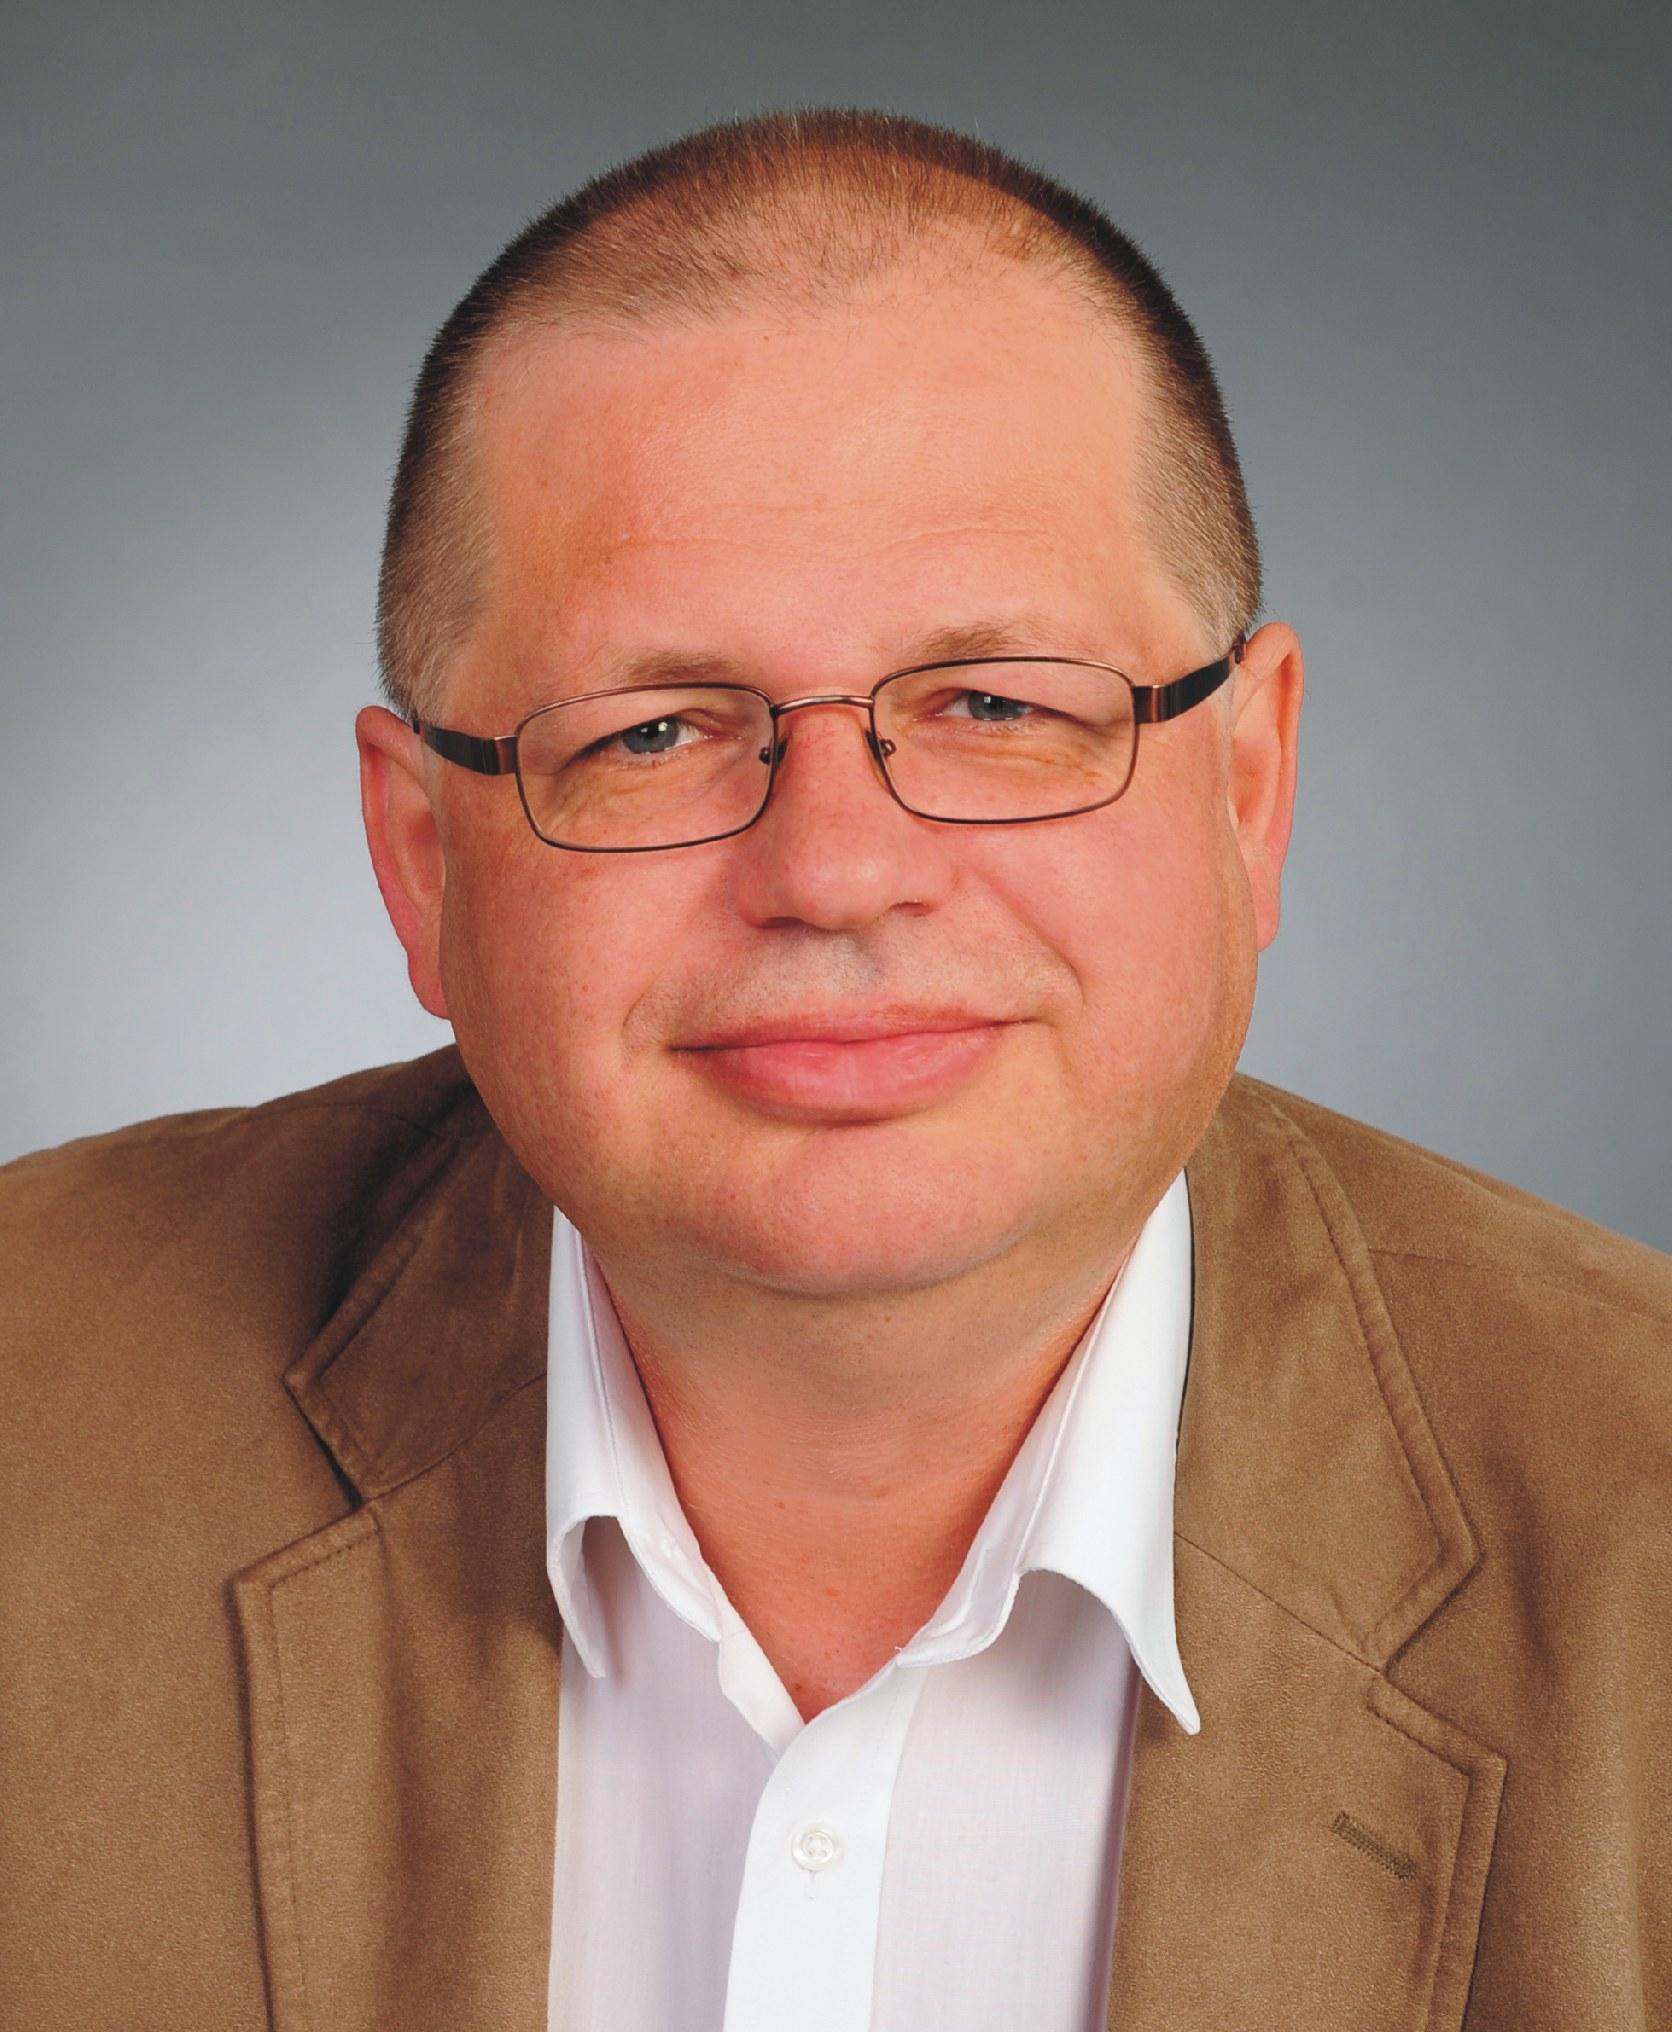 Diplom-Jurist Thomas Krug im Interview